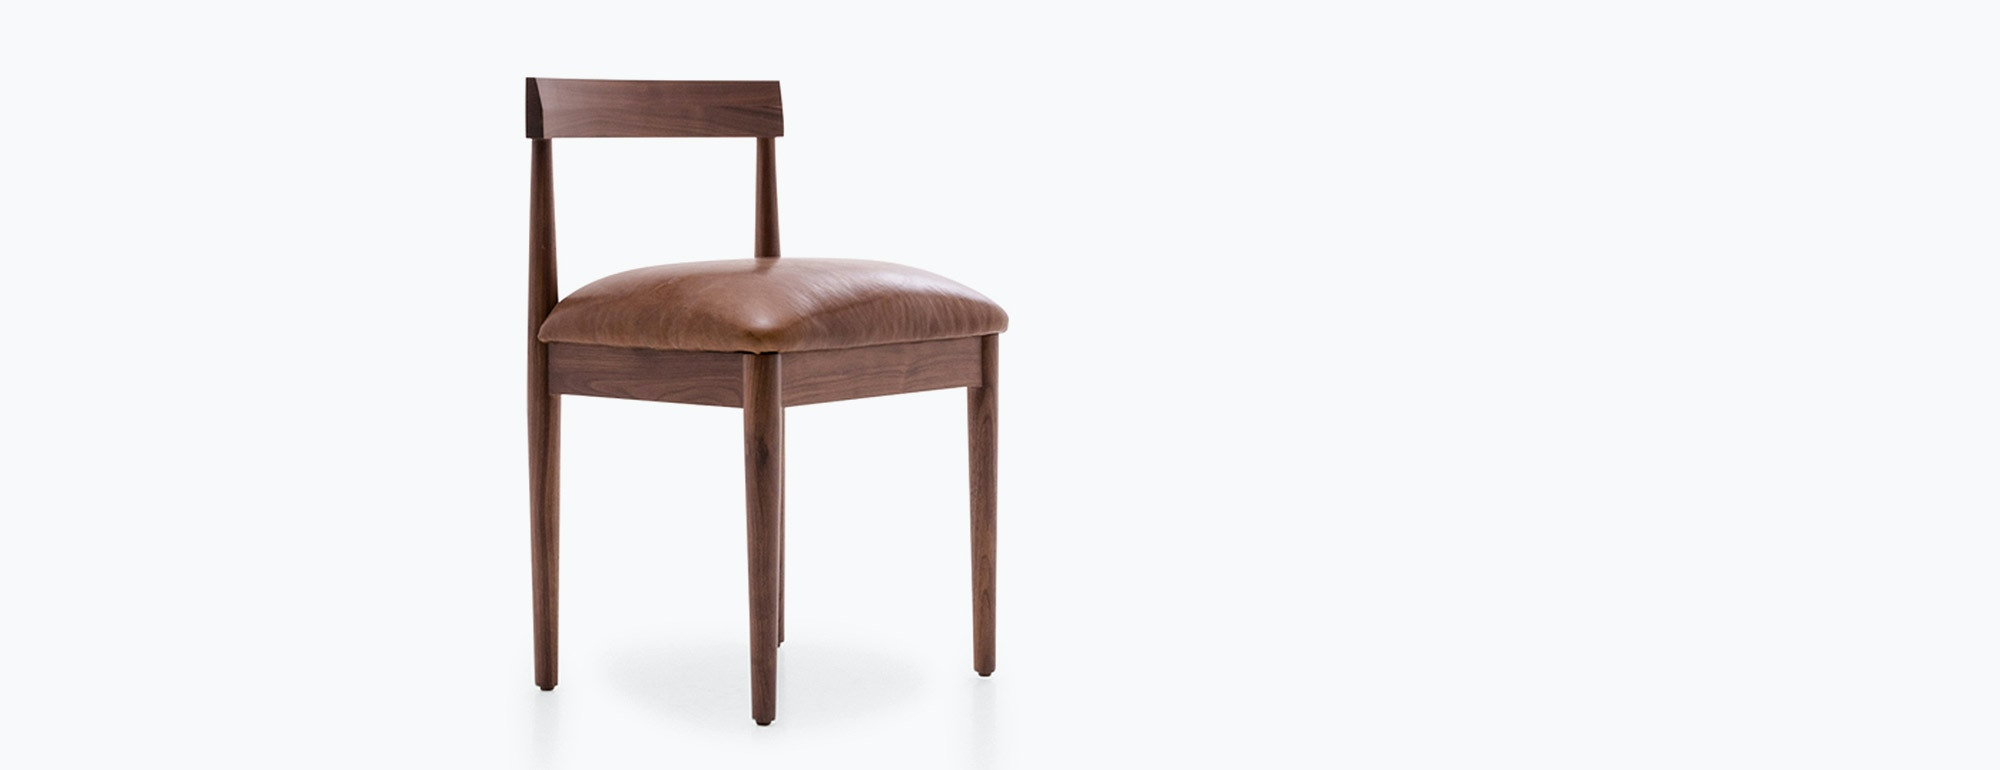 shown in Brompton Classic Leather